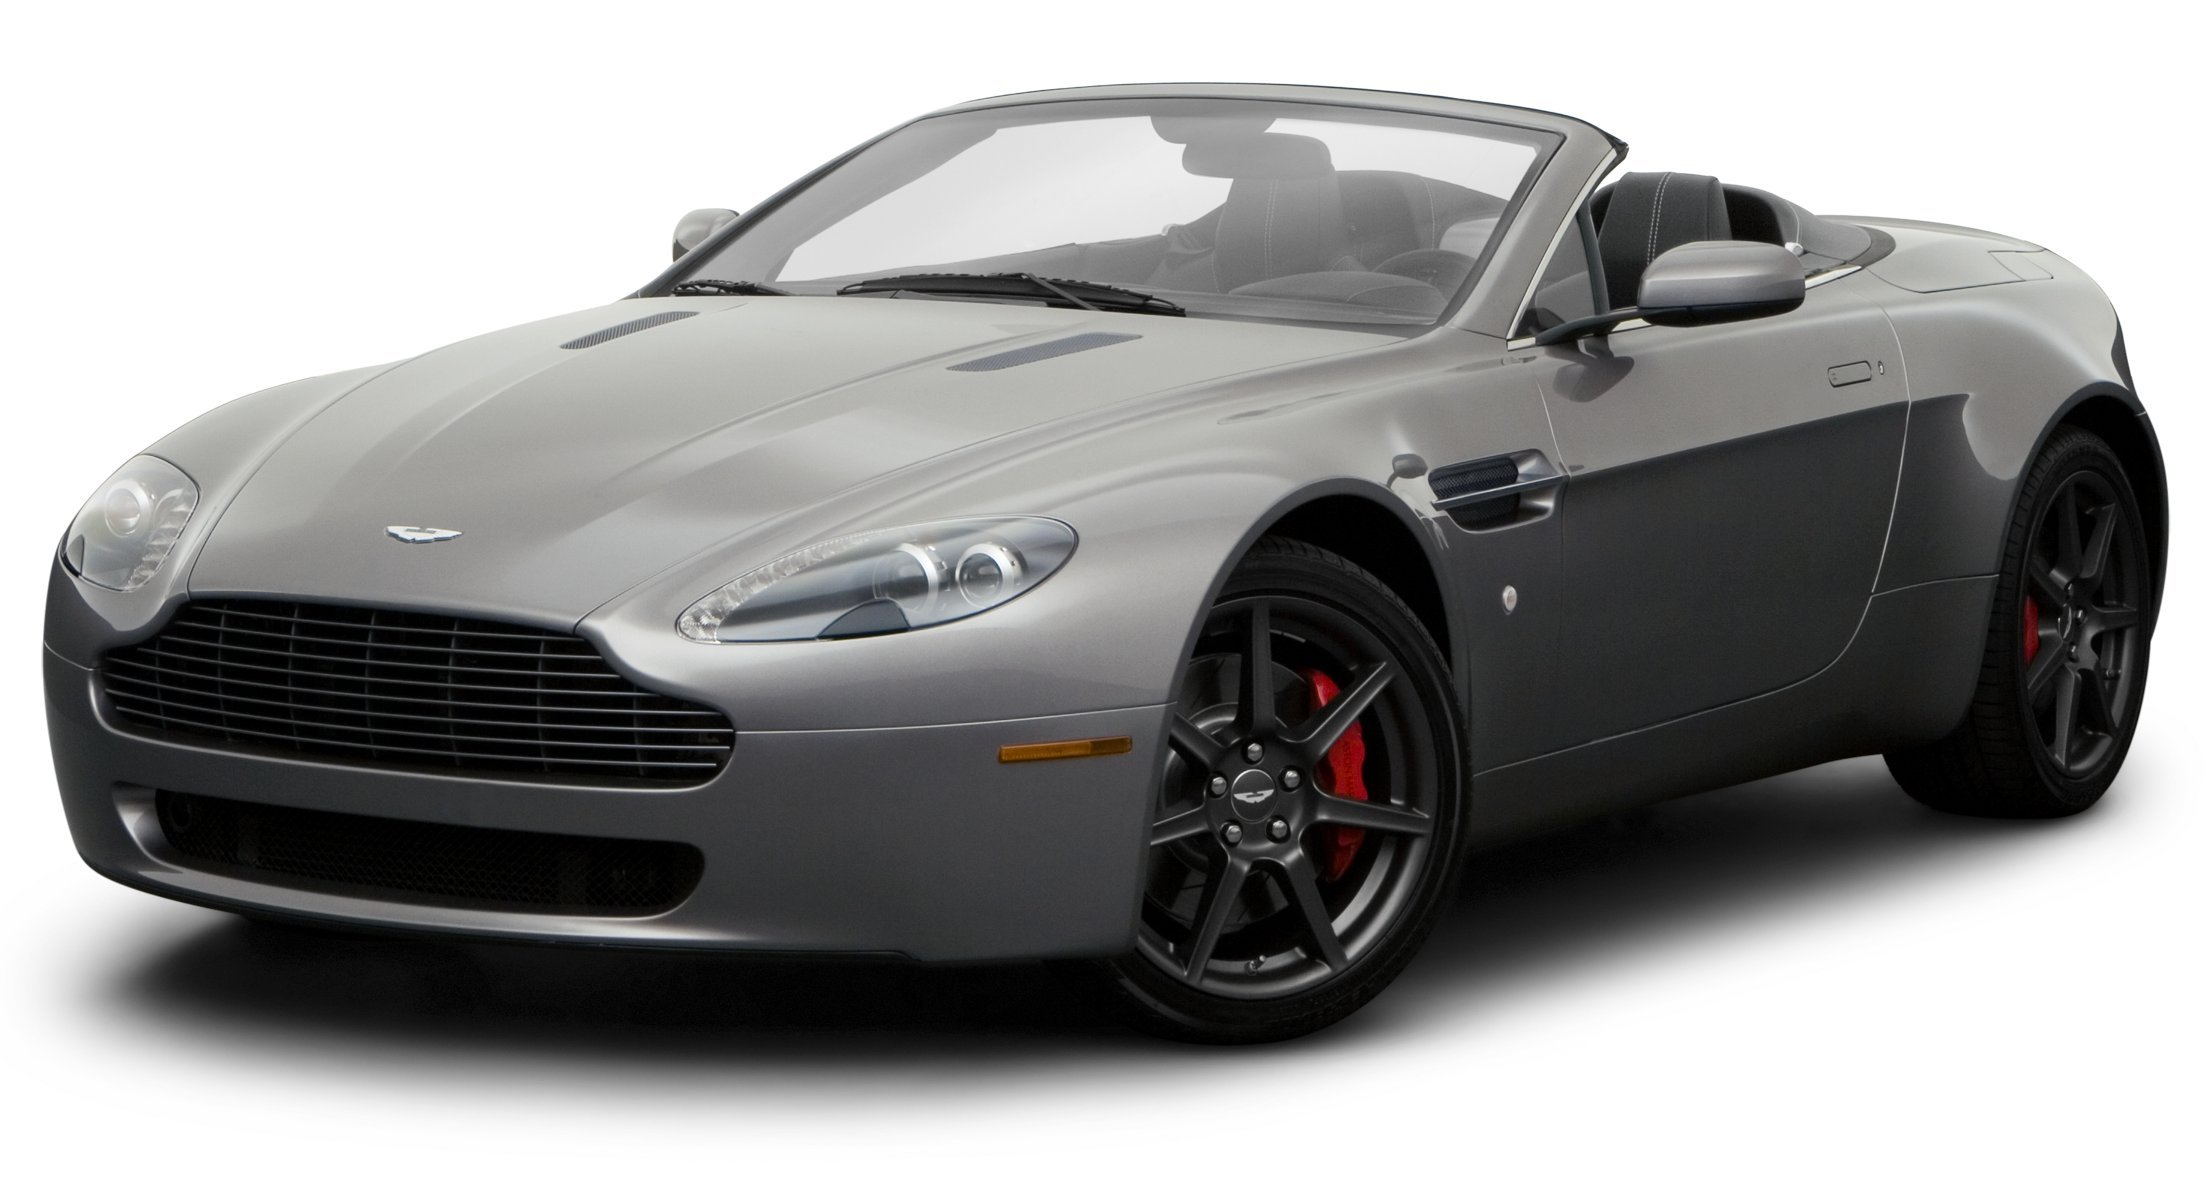 Amazon Com 2008 Aston Martin V8 Vantage Reviews Images And Specs Vehicles